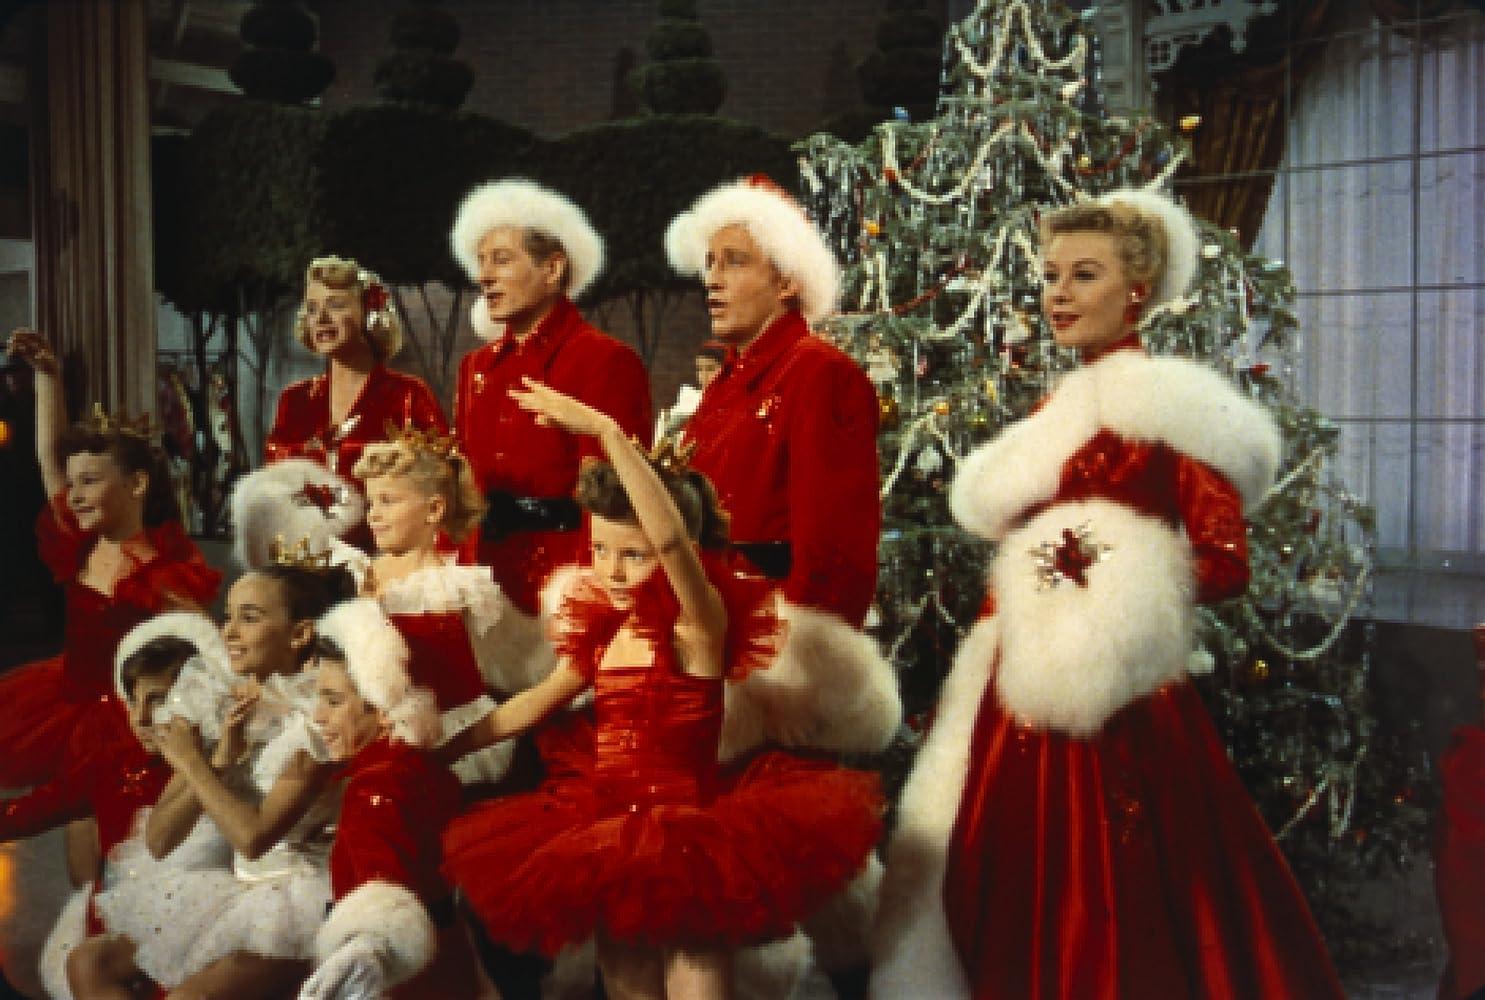 bing crosby danny kaye rosemary clooney and vera ellen in white christmas - Danny Kaye White Christmas